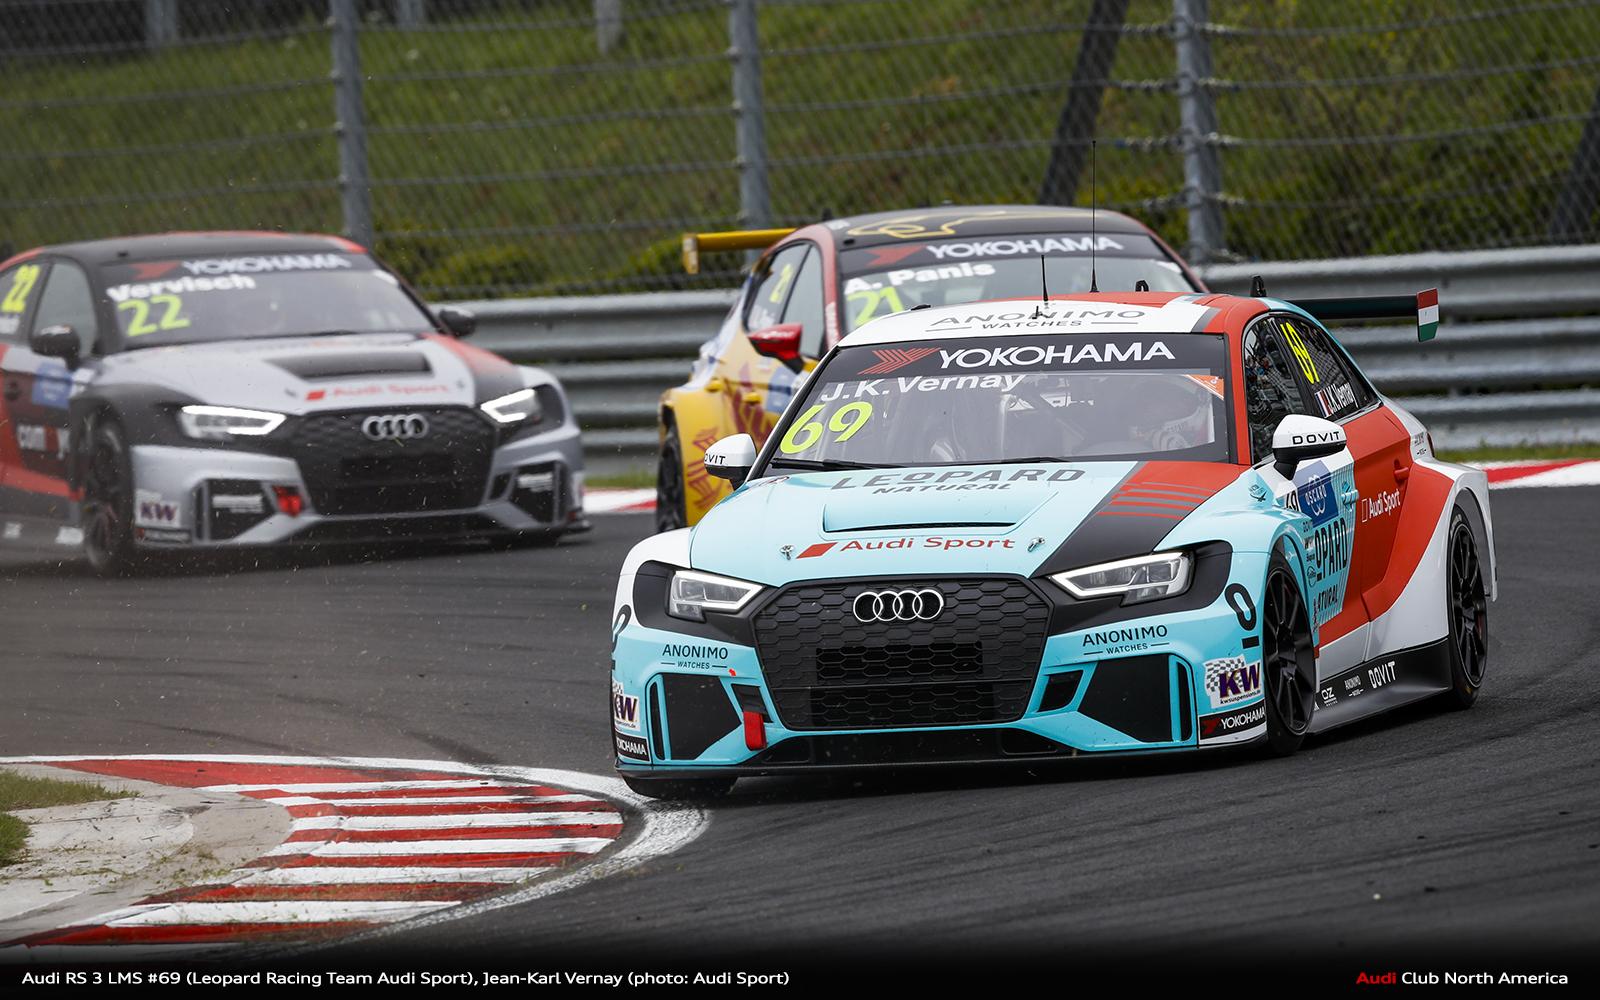 Third Podium Result for Audi Sport in 2019 FIA WTCR